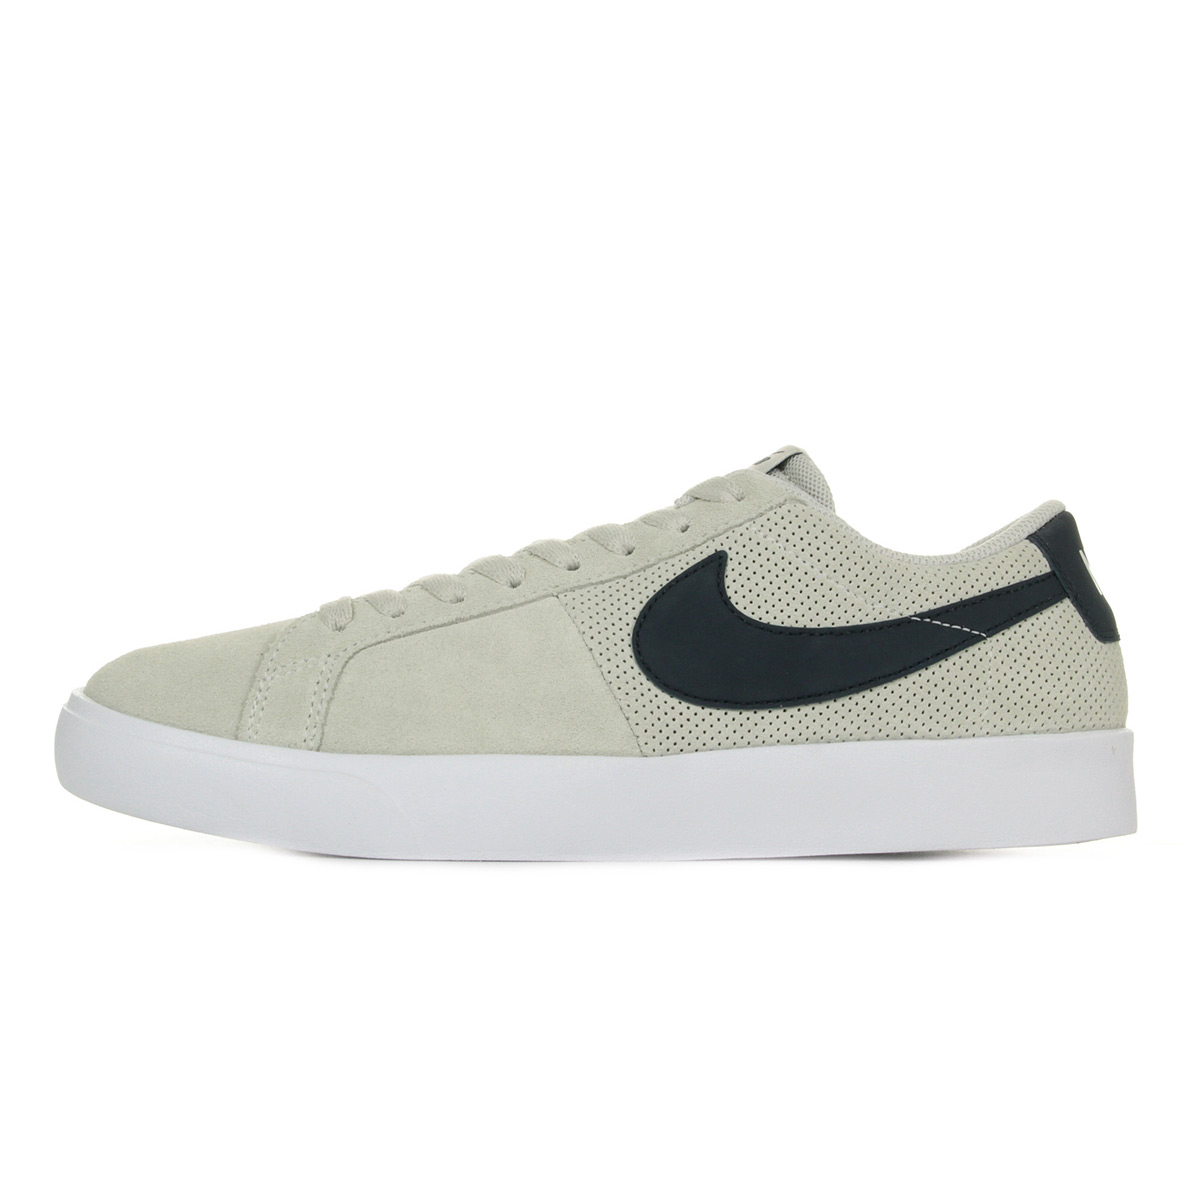 detailed look 68fc0 bb592 Chaussures Baskets Nike homme SB Blazer Vapor taille Beige Cuir ...